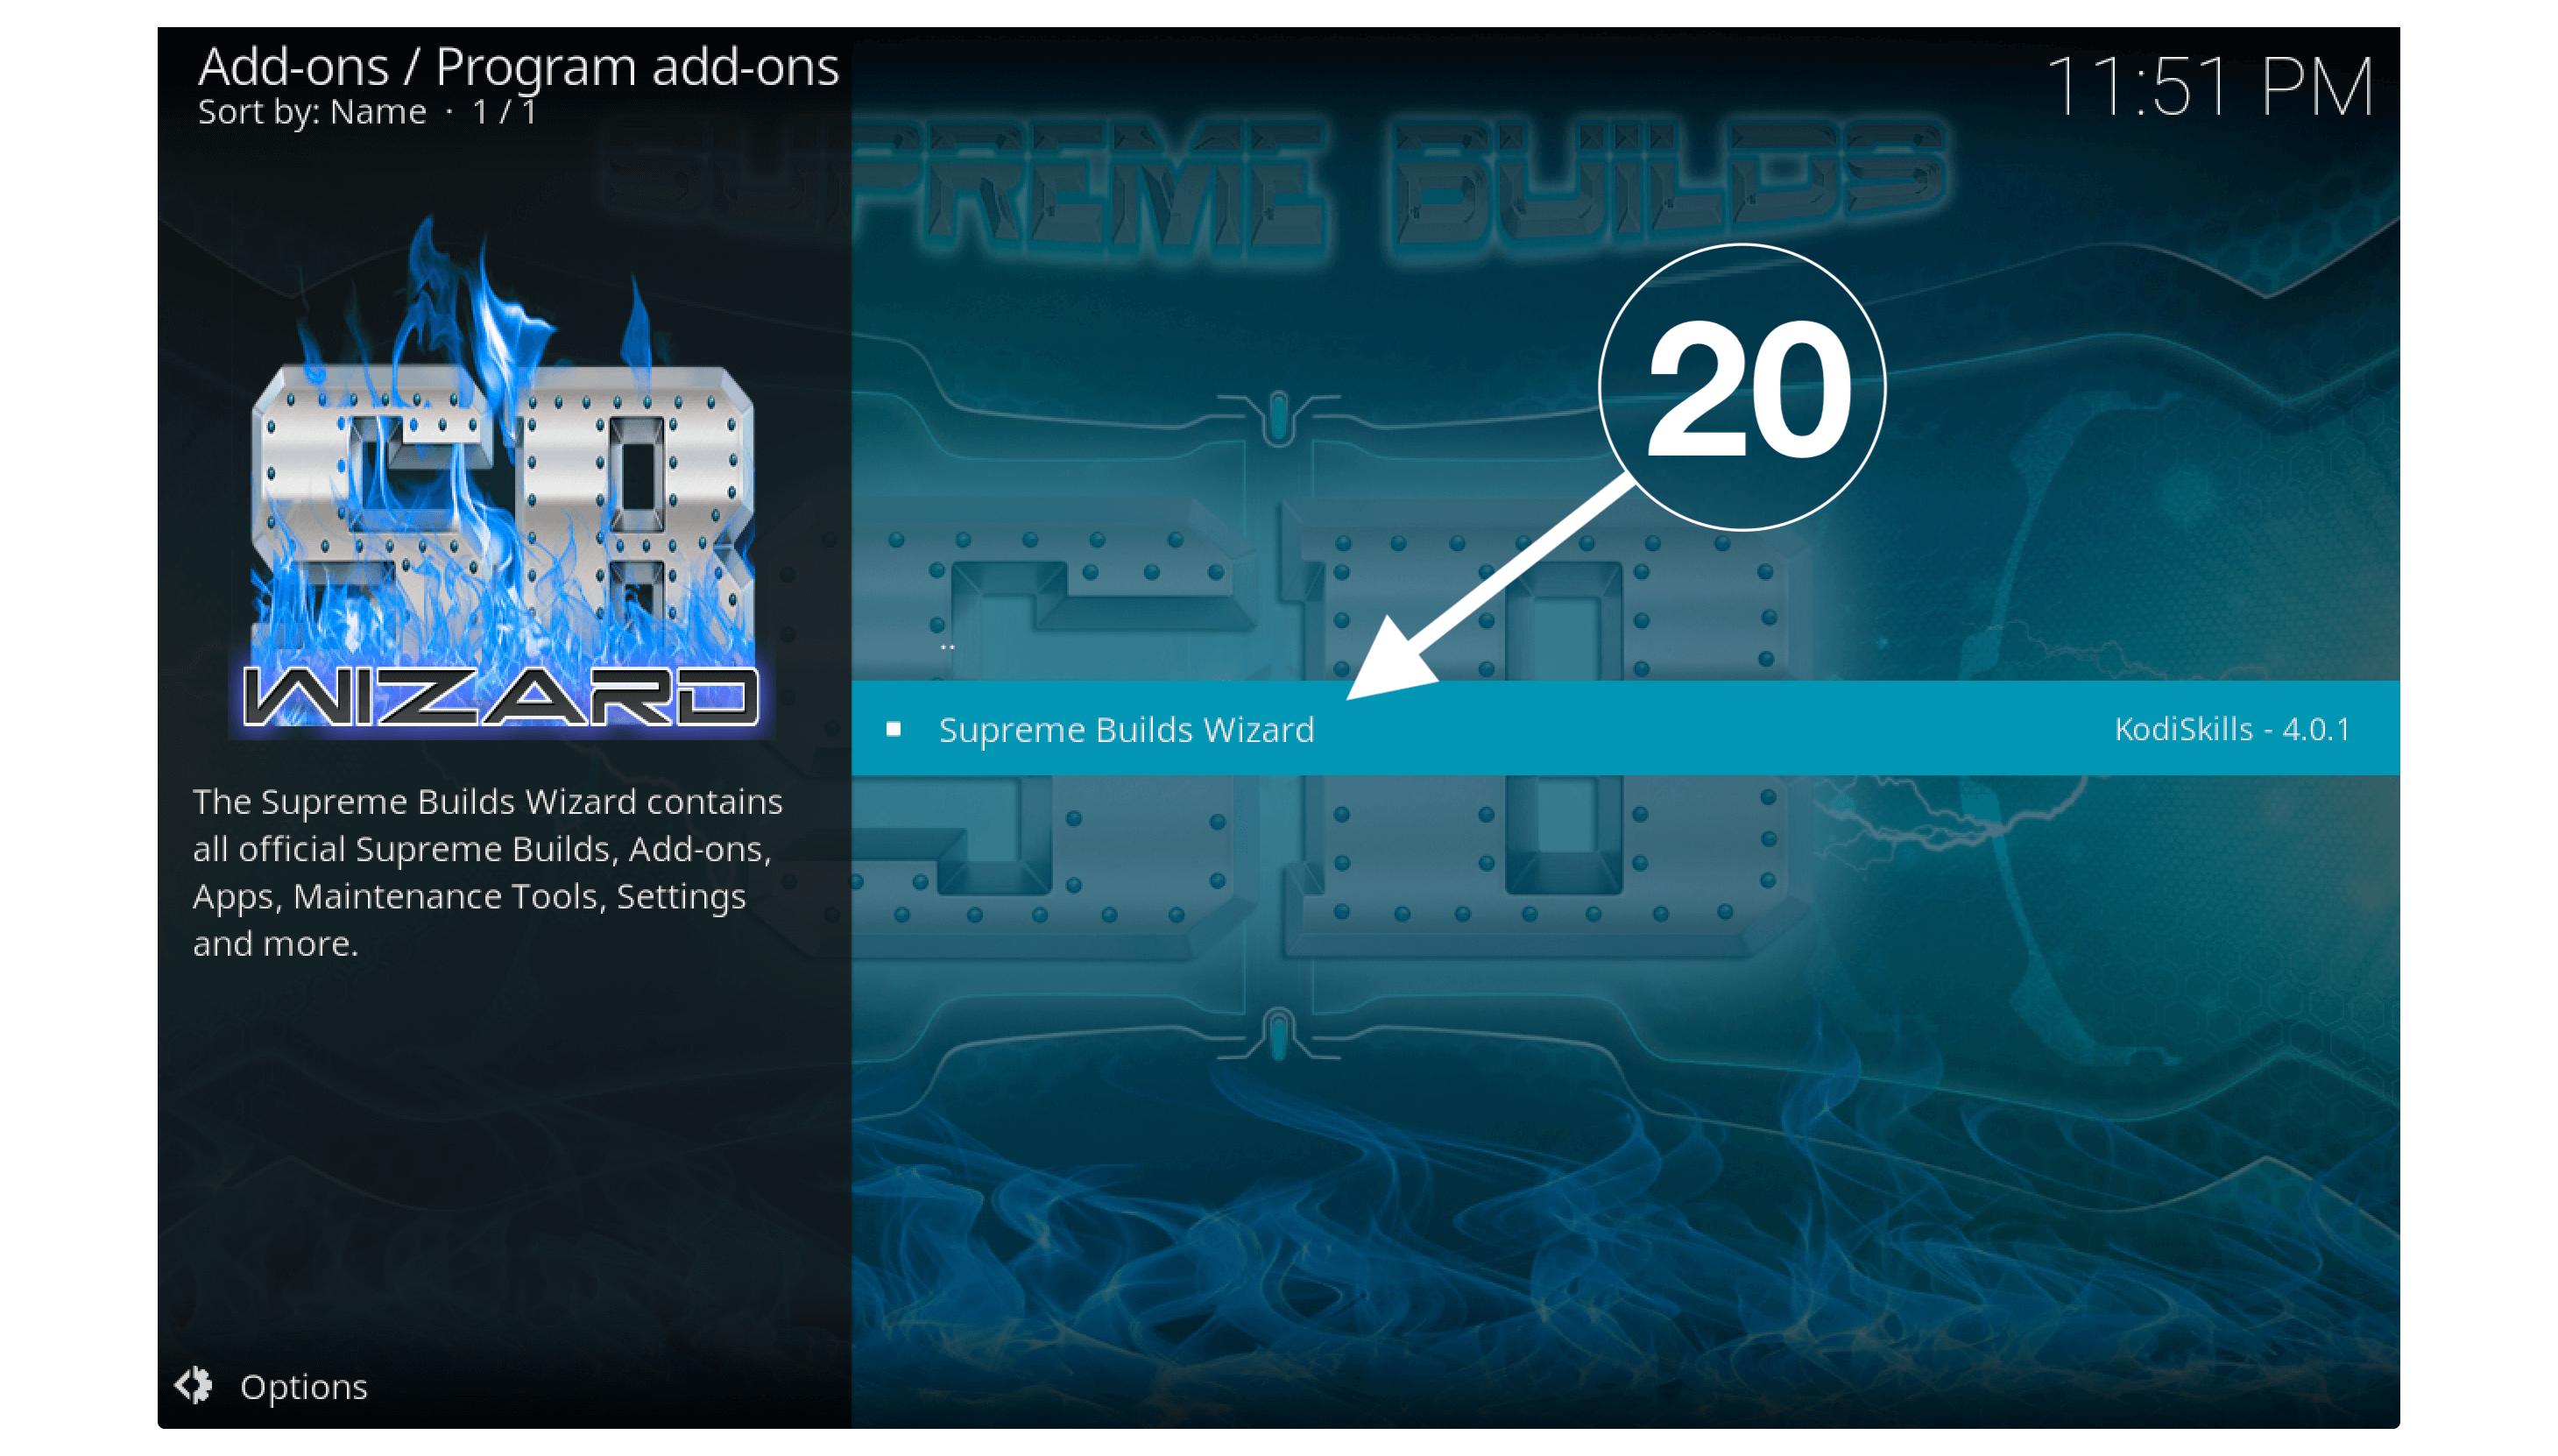 Titanium-Build-on-Kodi-latest-version